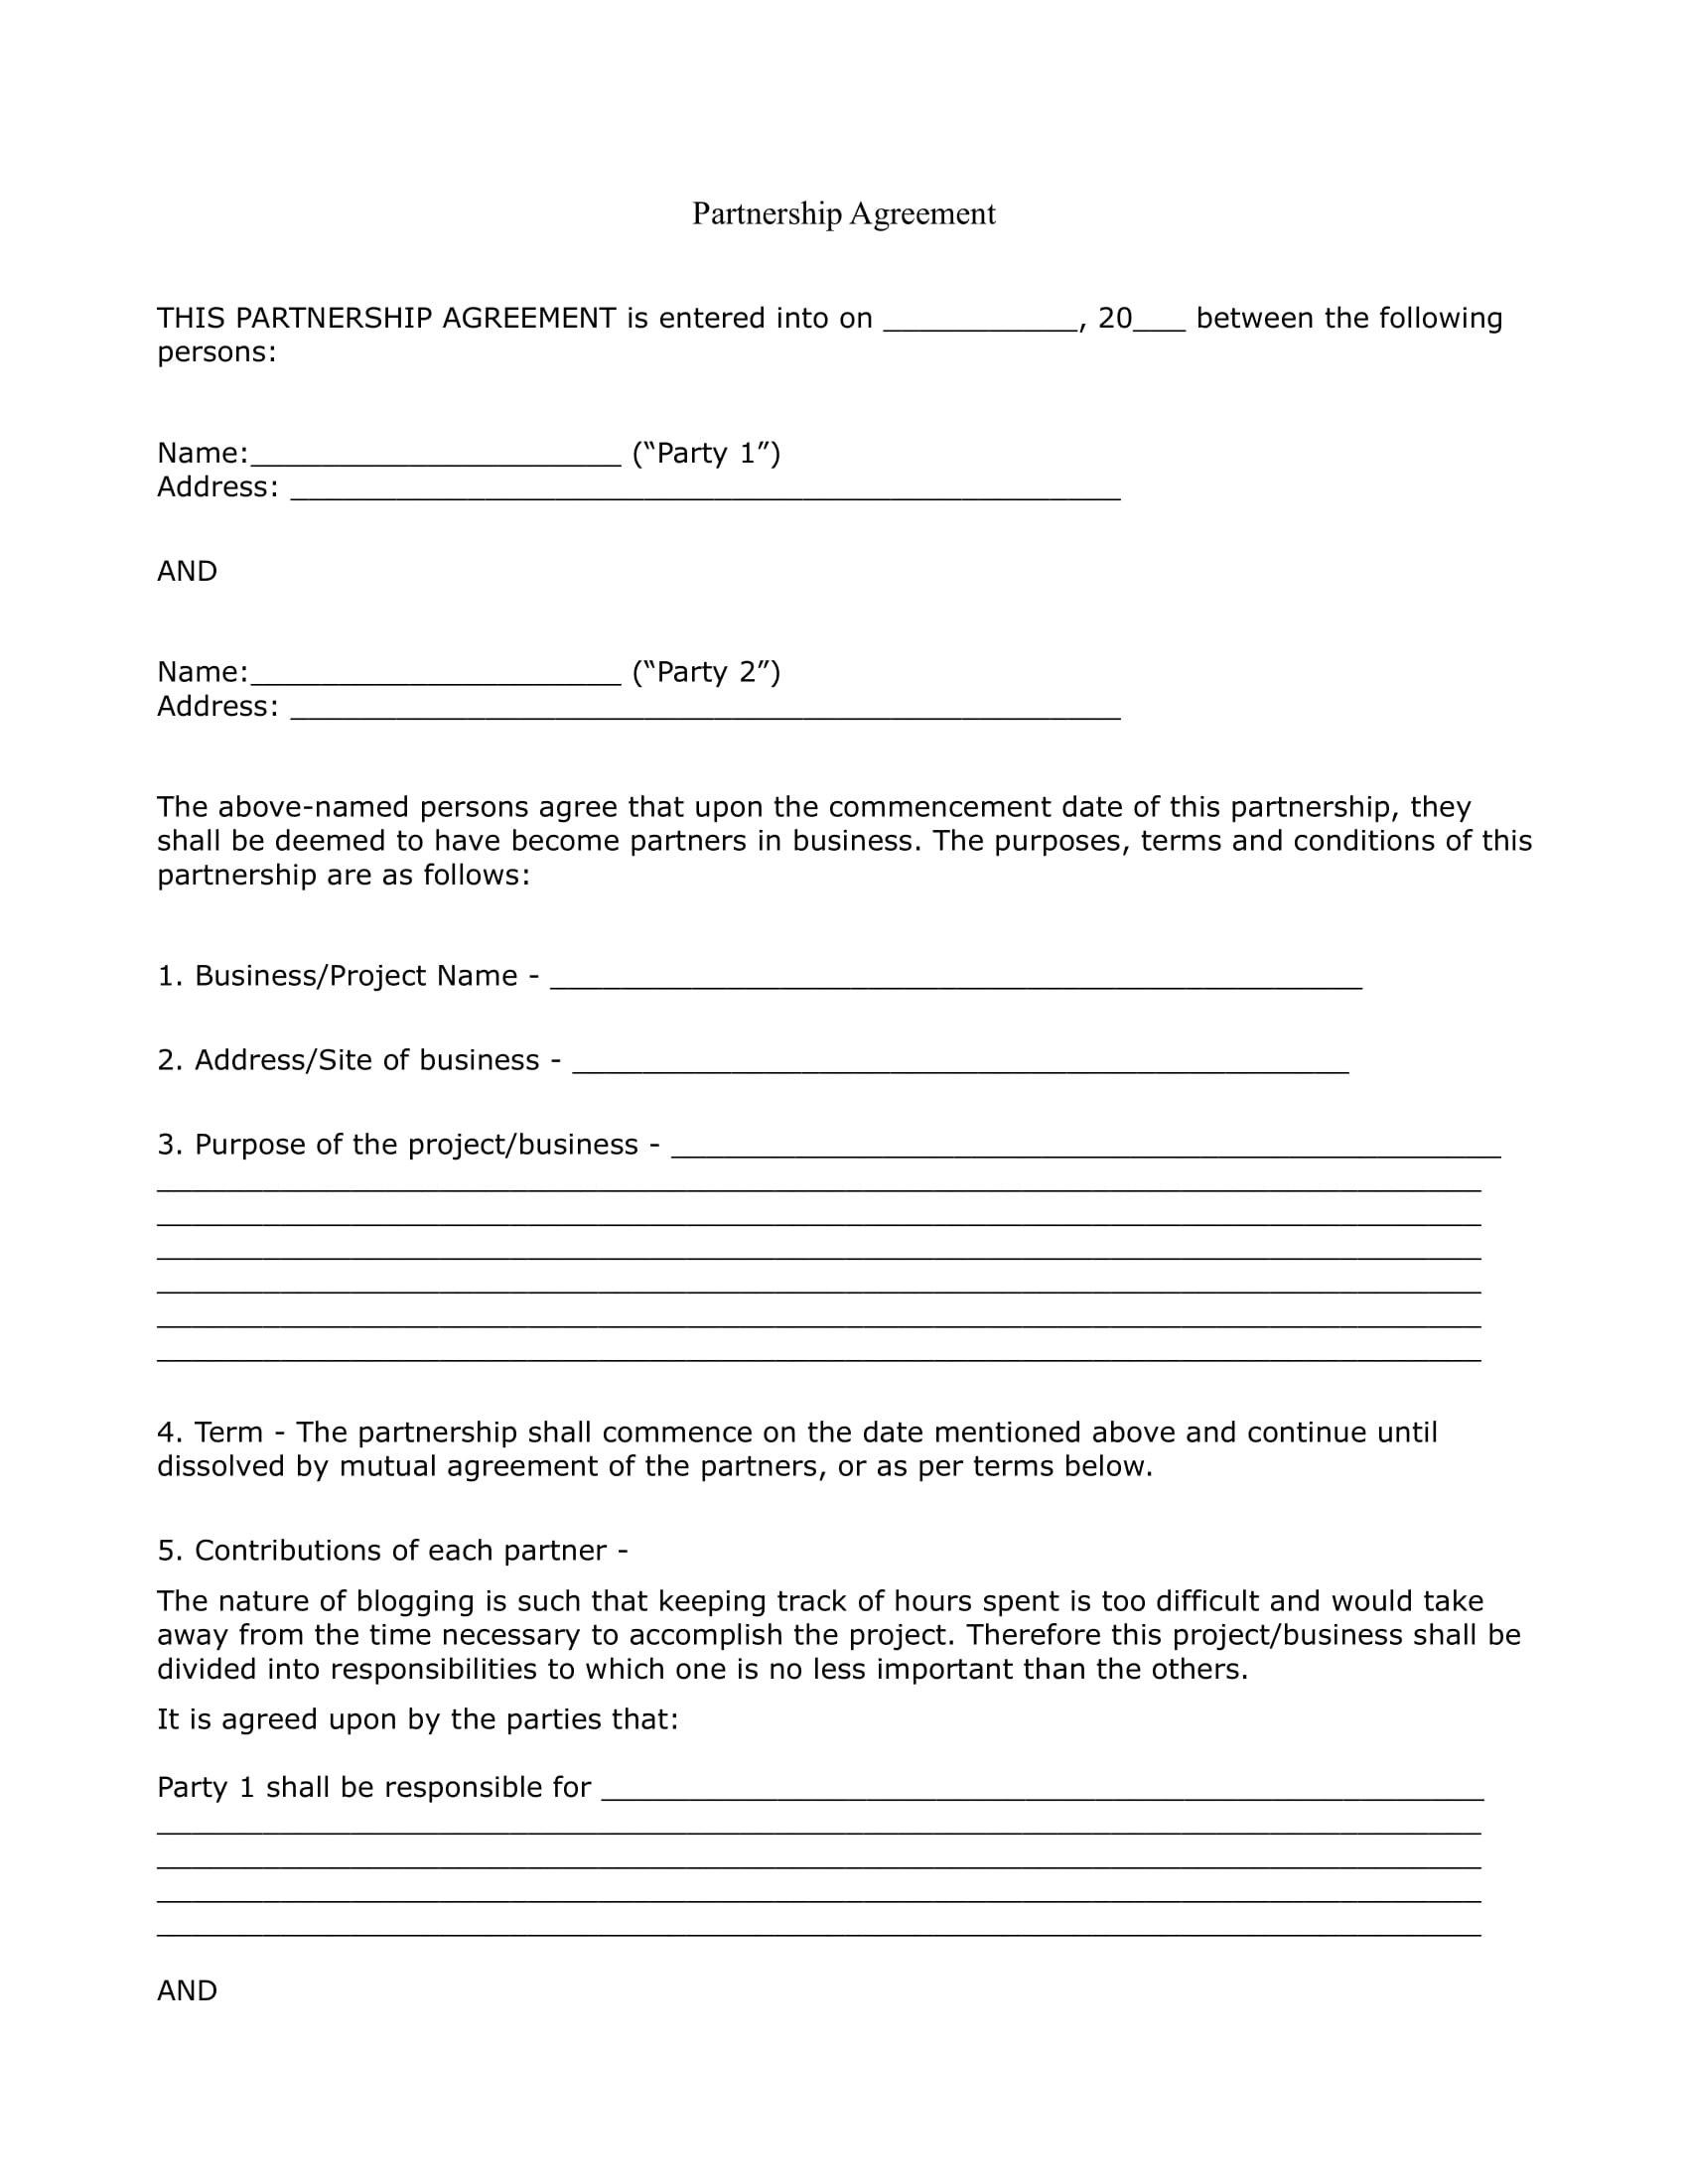 Partnership Agreement Templates Examples  Pdf Doc  Examples Inside Template For Business Partnership Agreement